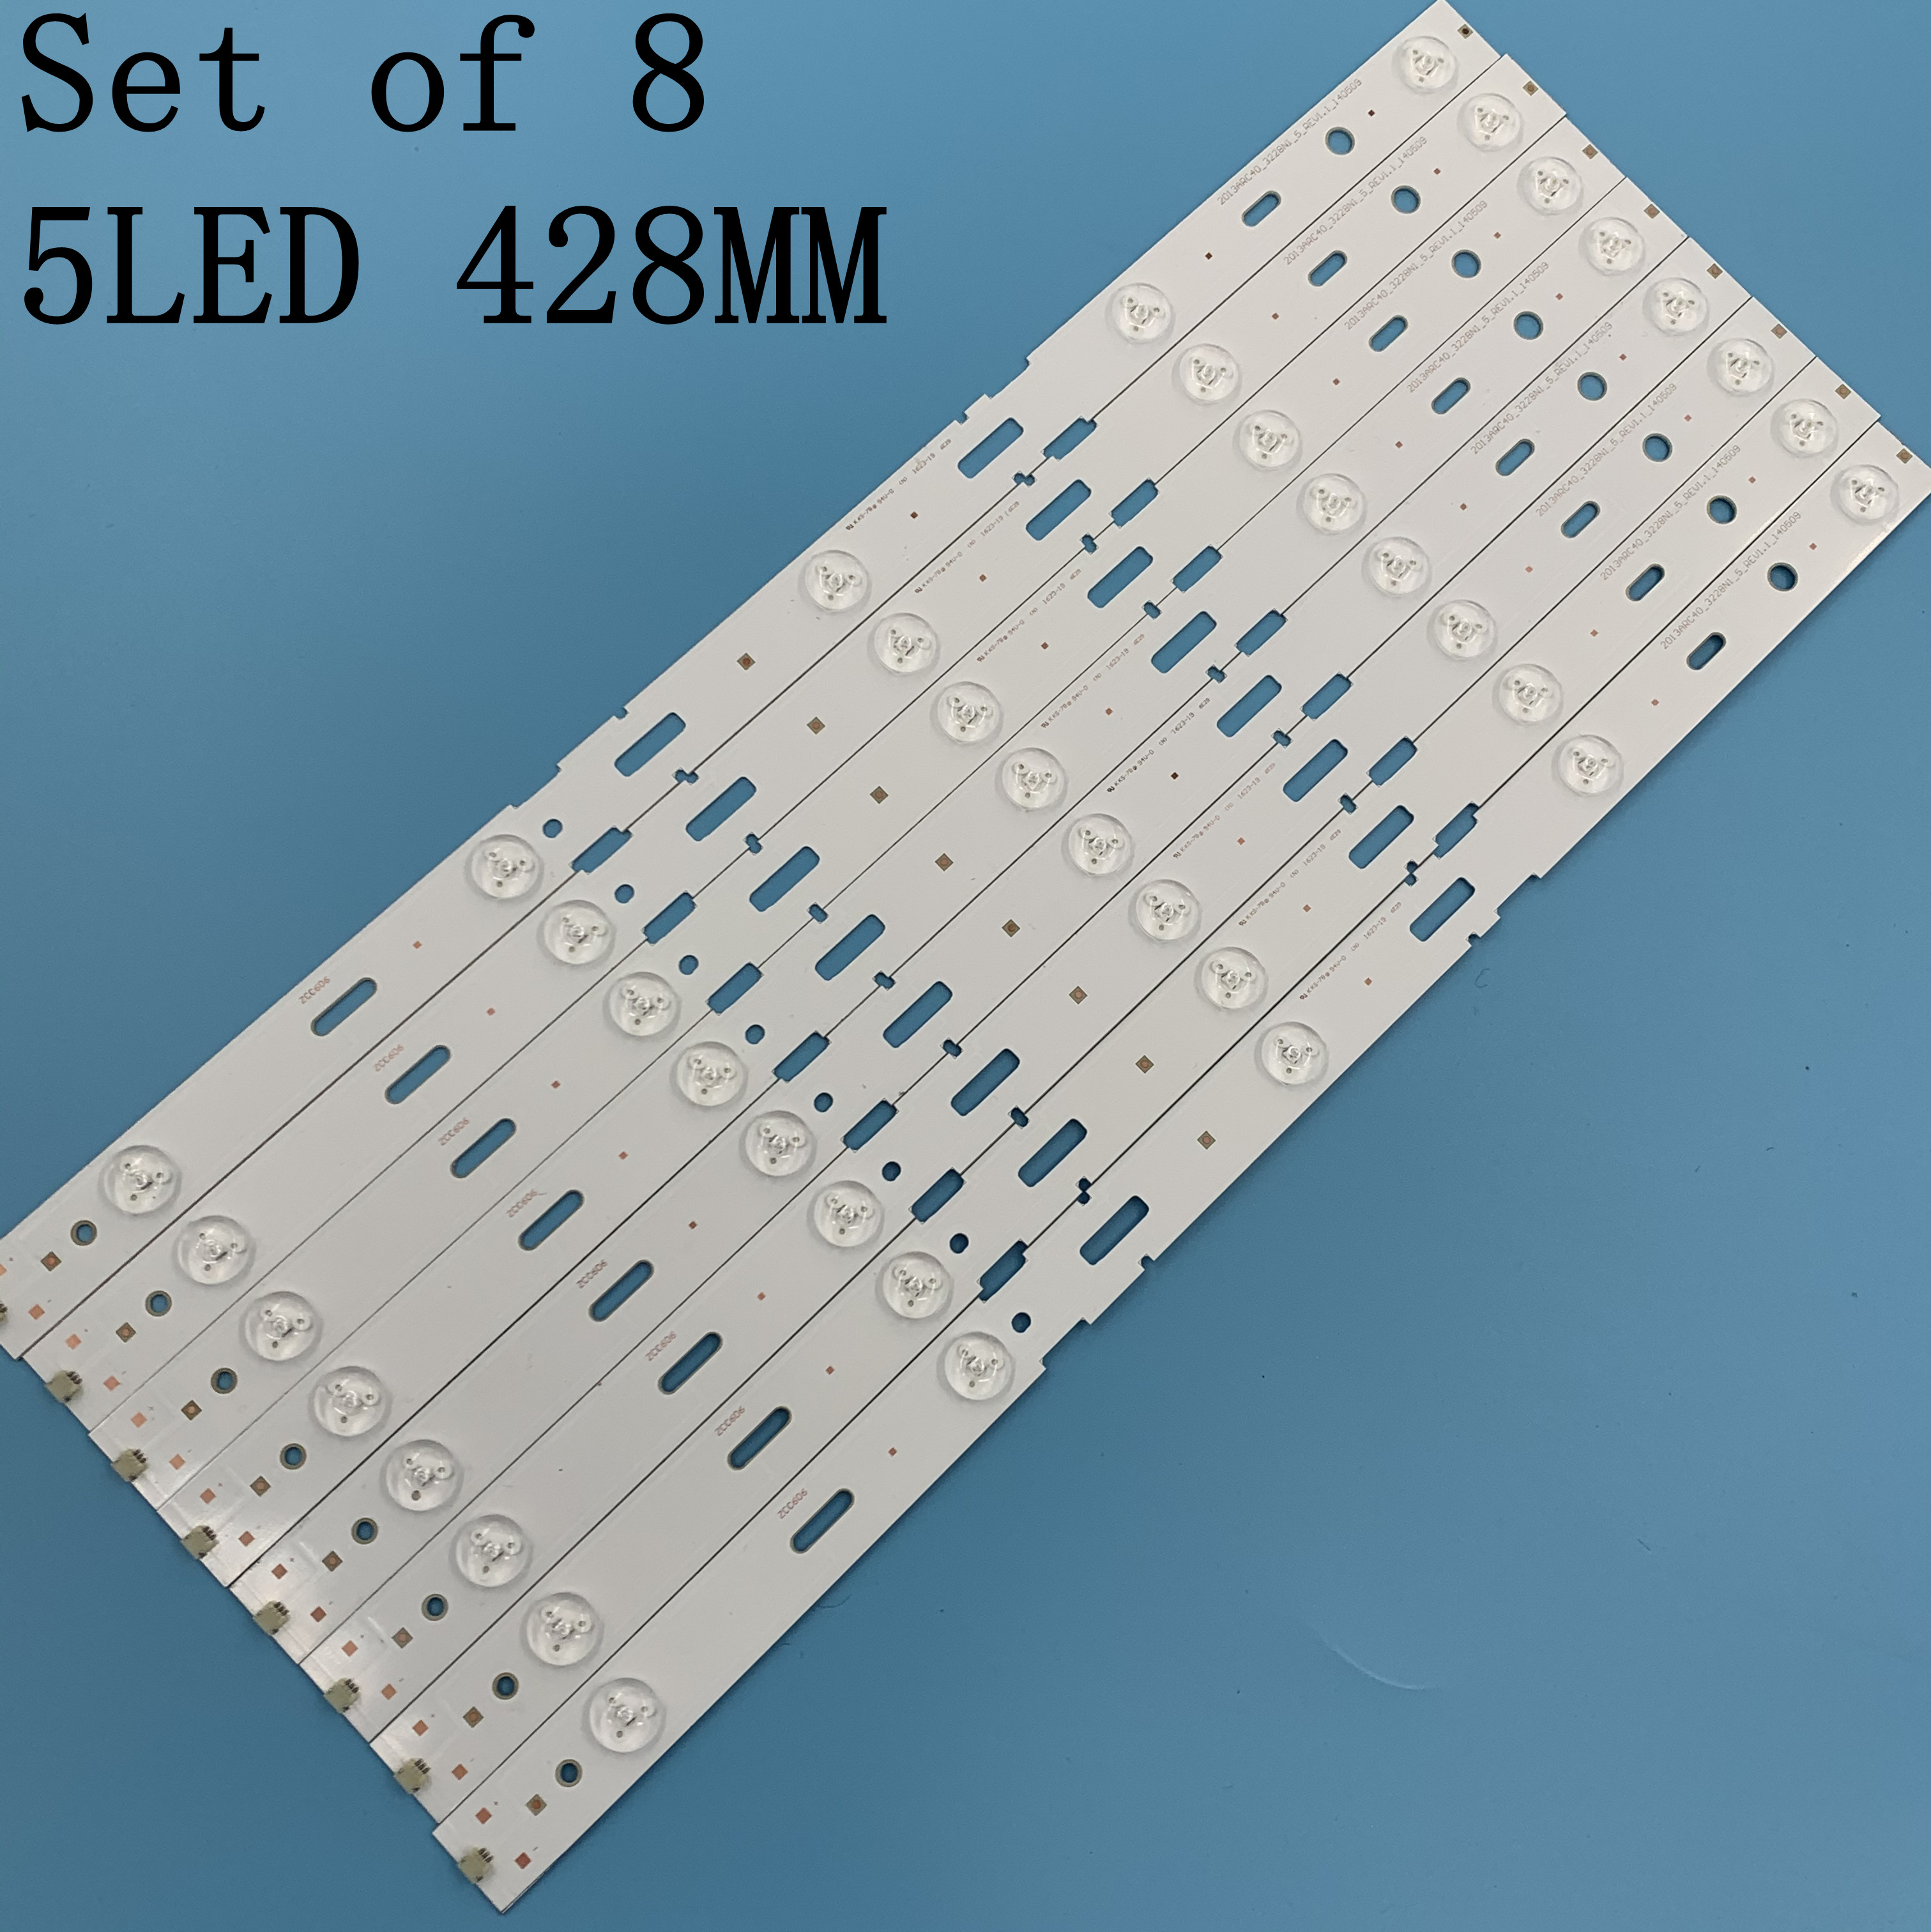 8pcs 428mm LED Backlight strip 5leds For Sam sung 40 inch TV 40-LB-M520 40VLE4421BF SAM SUNG_2013ARC40_3228N1 40VLE6520BL